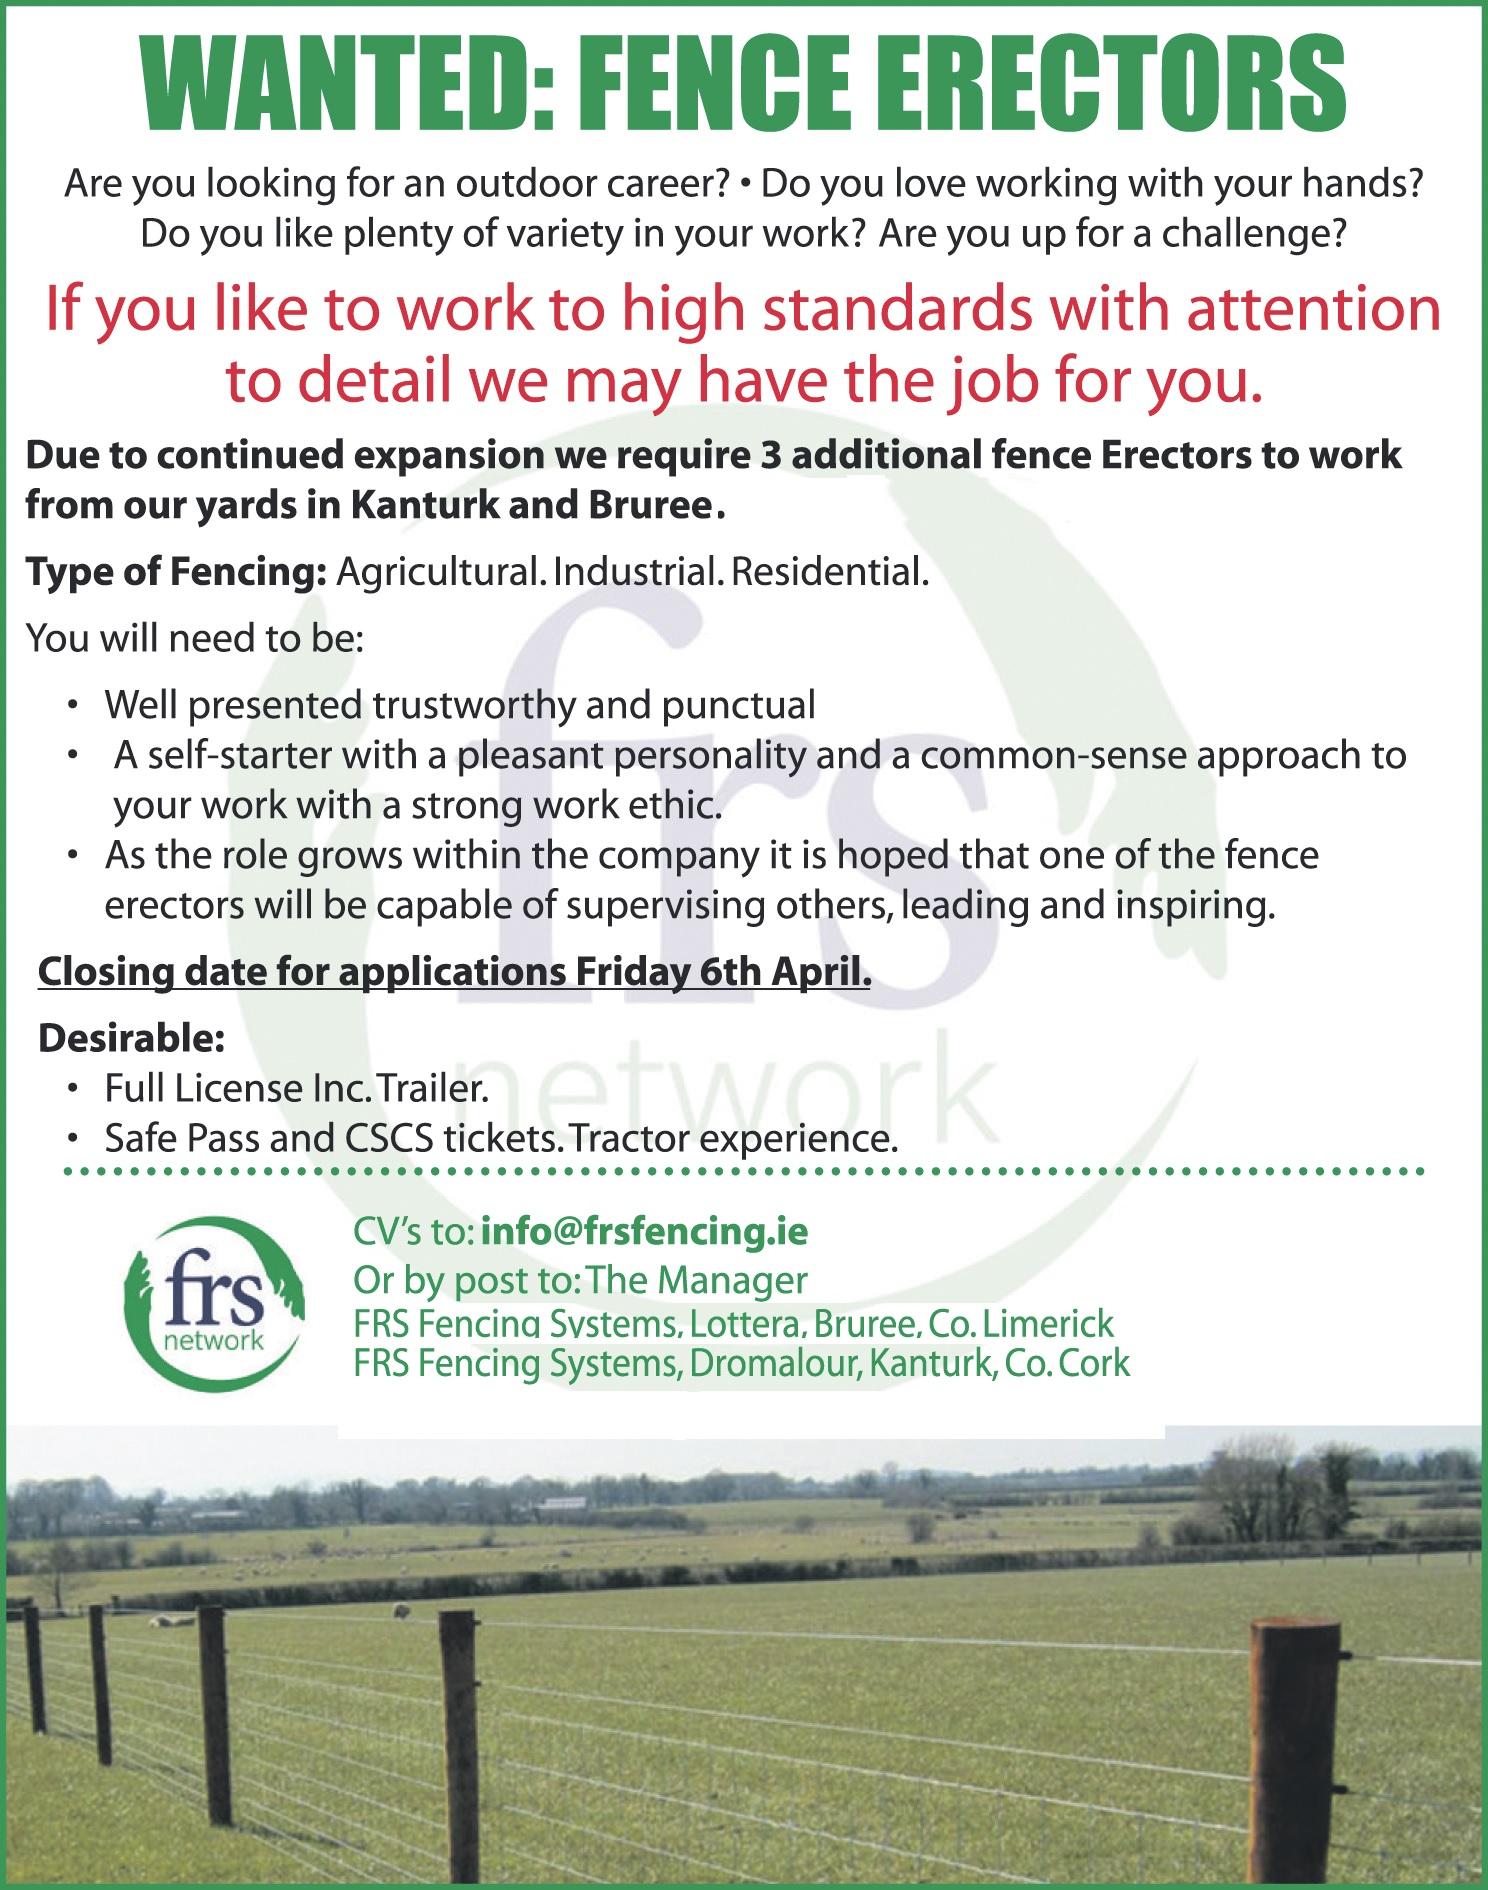 wanted: fence erectors